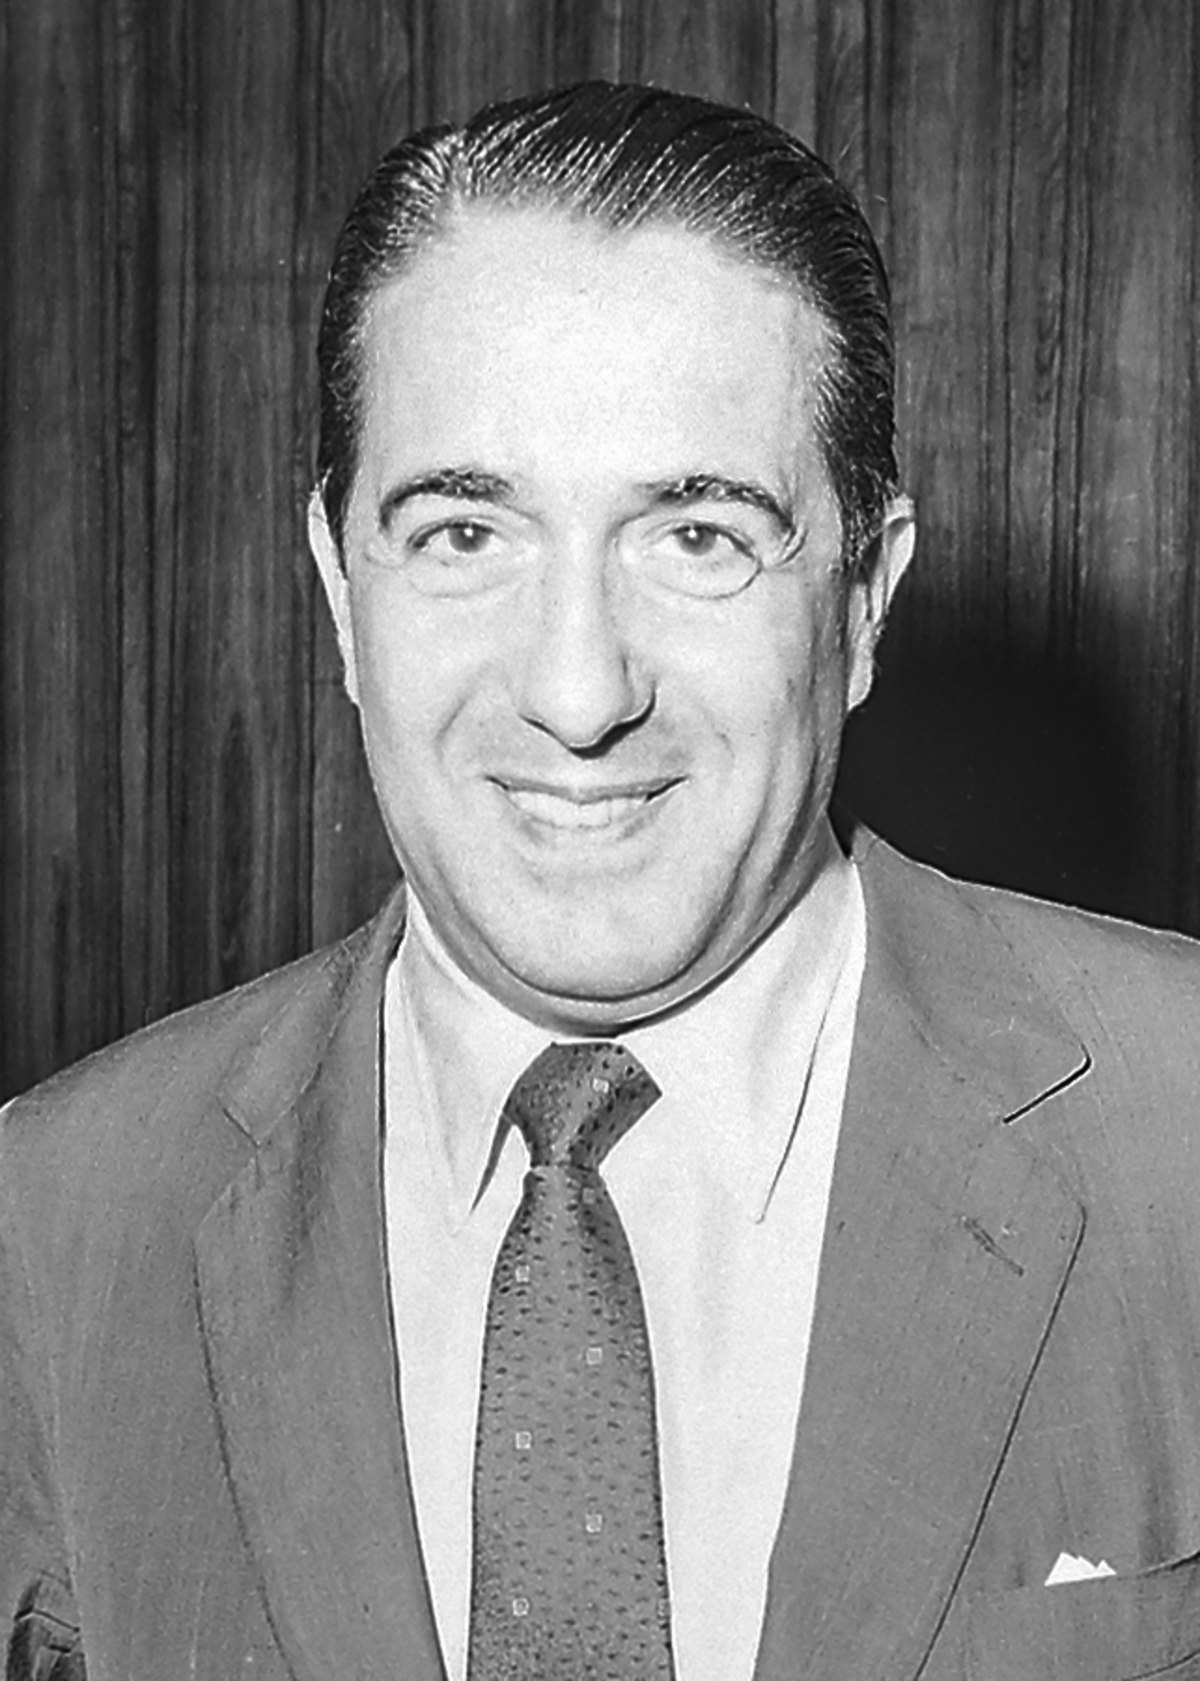 dcc72fe64a8 Walther Moreira Salles – Wikipédia